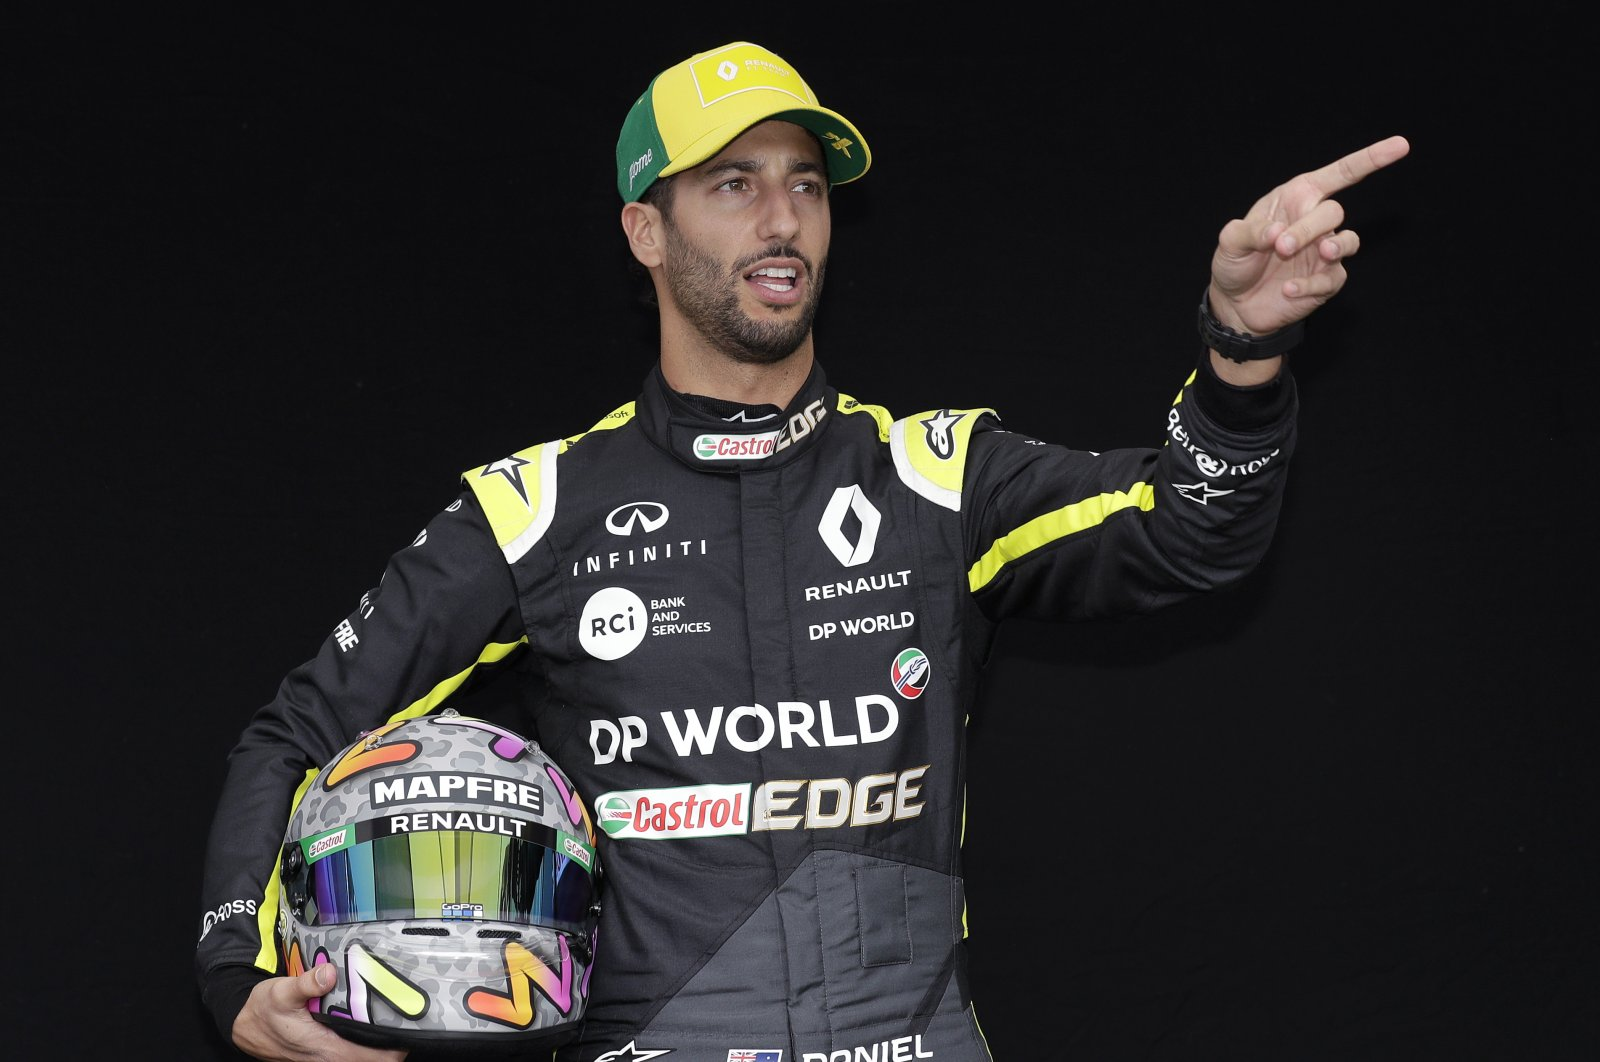 Daniel Ricciardo poses for a photo at the Australian GP in Melbourne, March 12, 2020. (AP Photo)